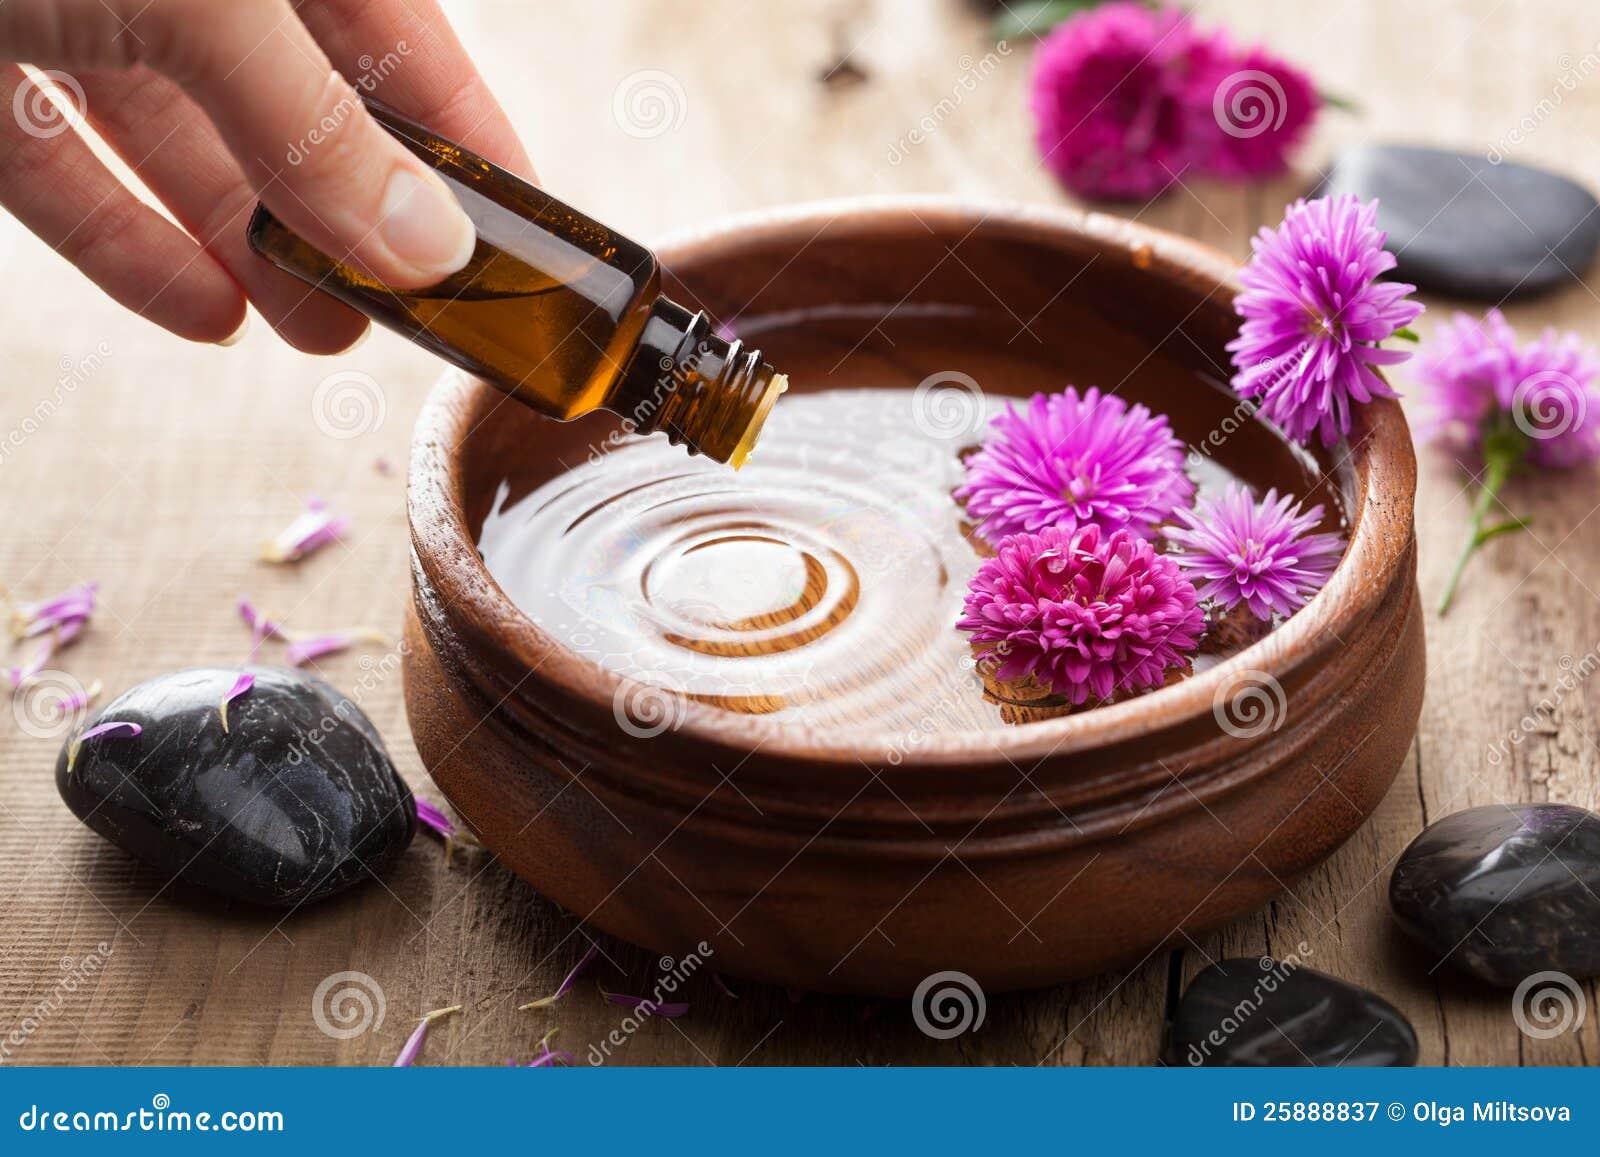 Petróleo esencial para aromatherapy